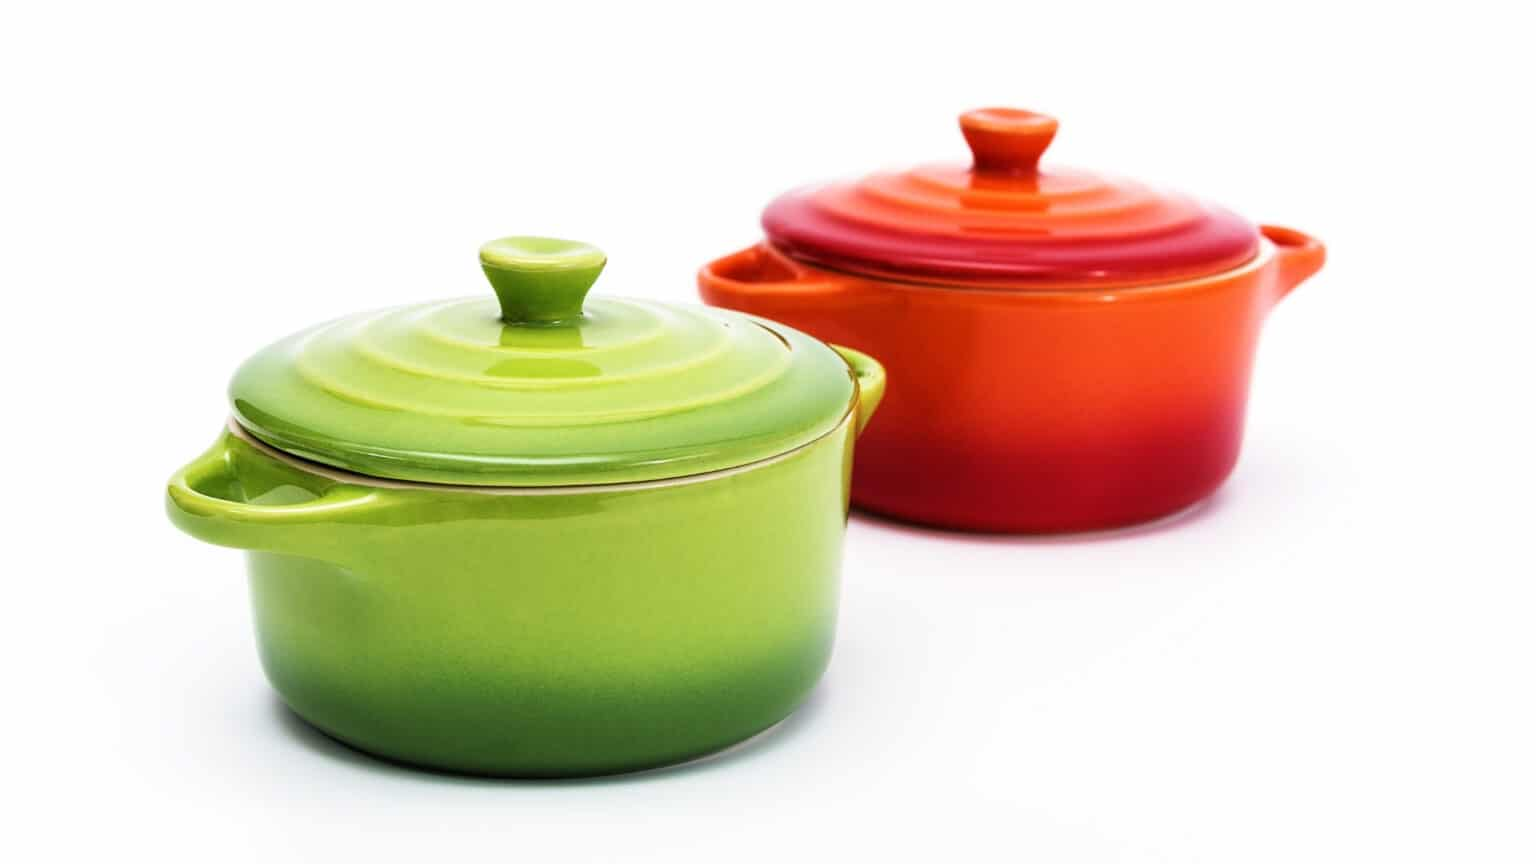 Dutch Oven Pot